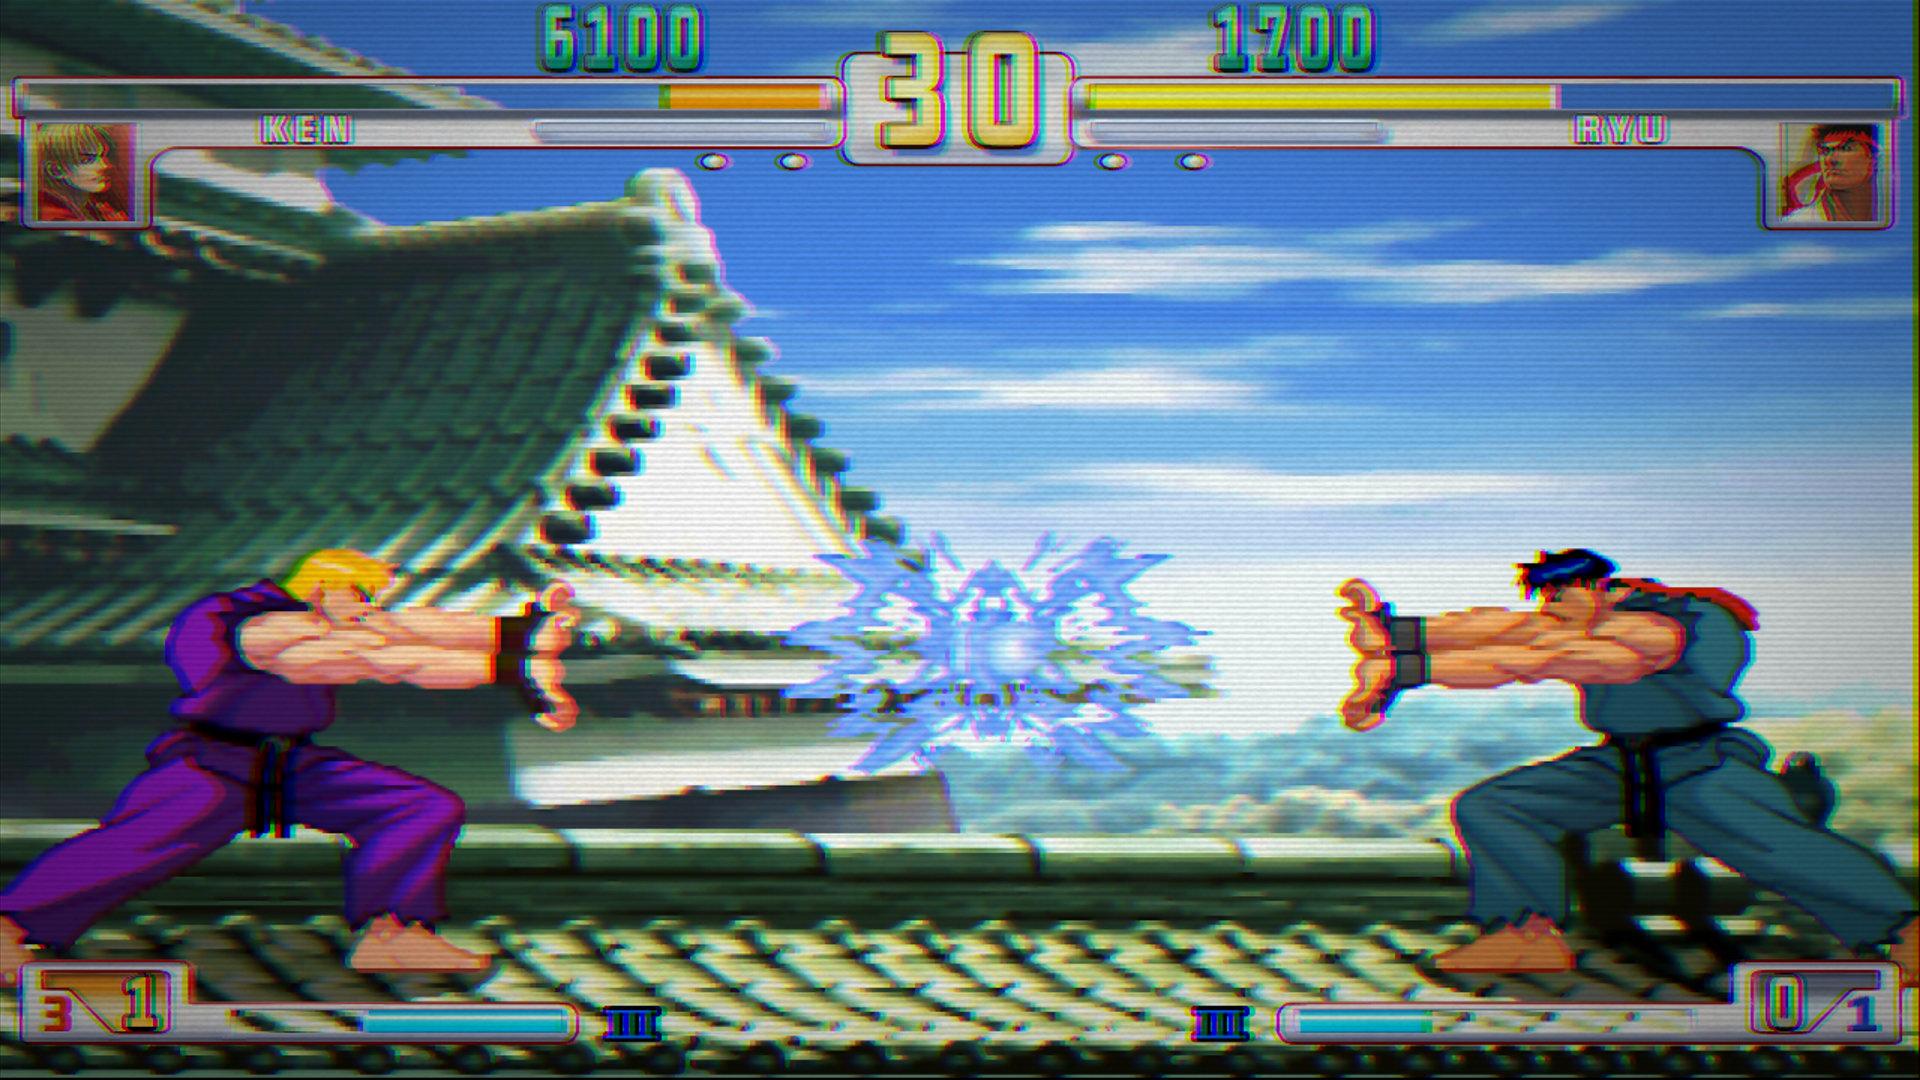 VIDEO] Capcom Play System 3 - Système - HFS Play HFS Play